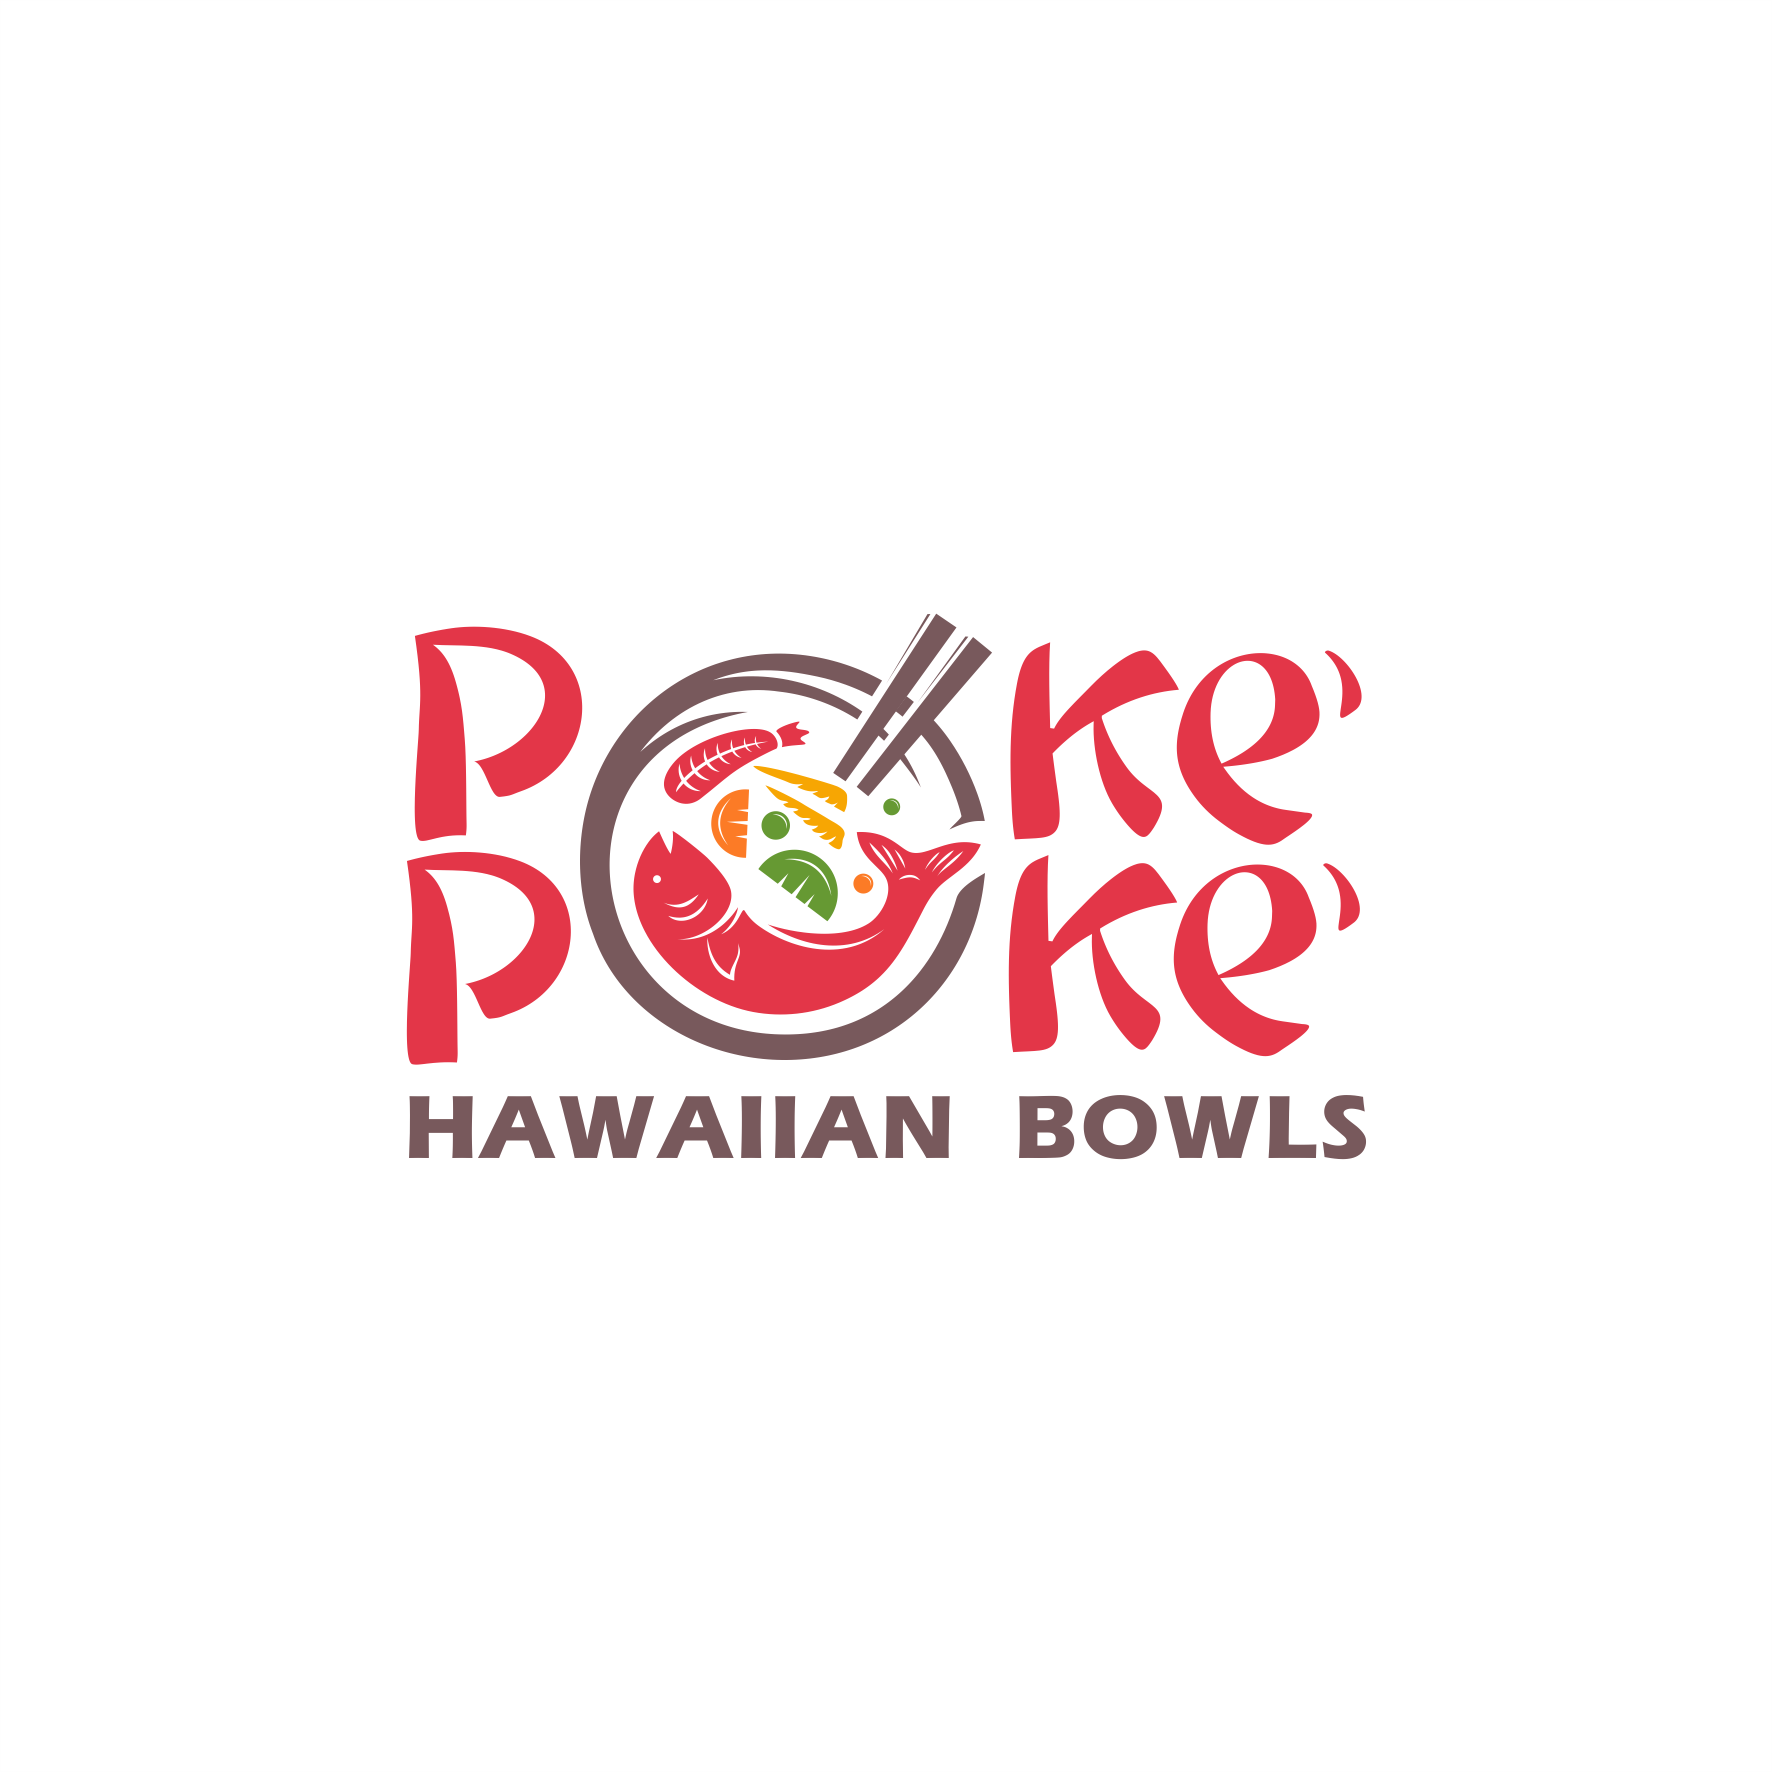 Poke' Bowl Restaurant Needs an Eye catching, modern, hip and memorable Design